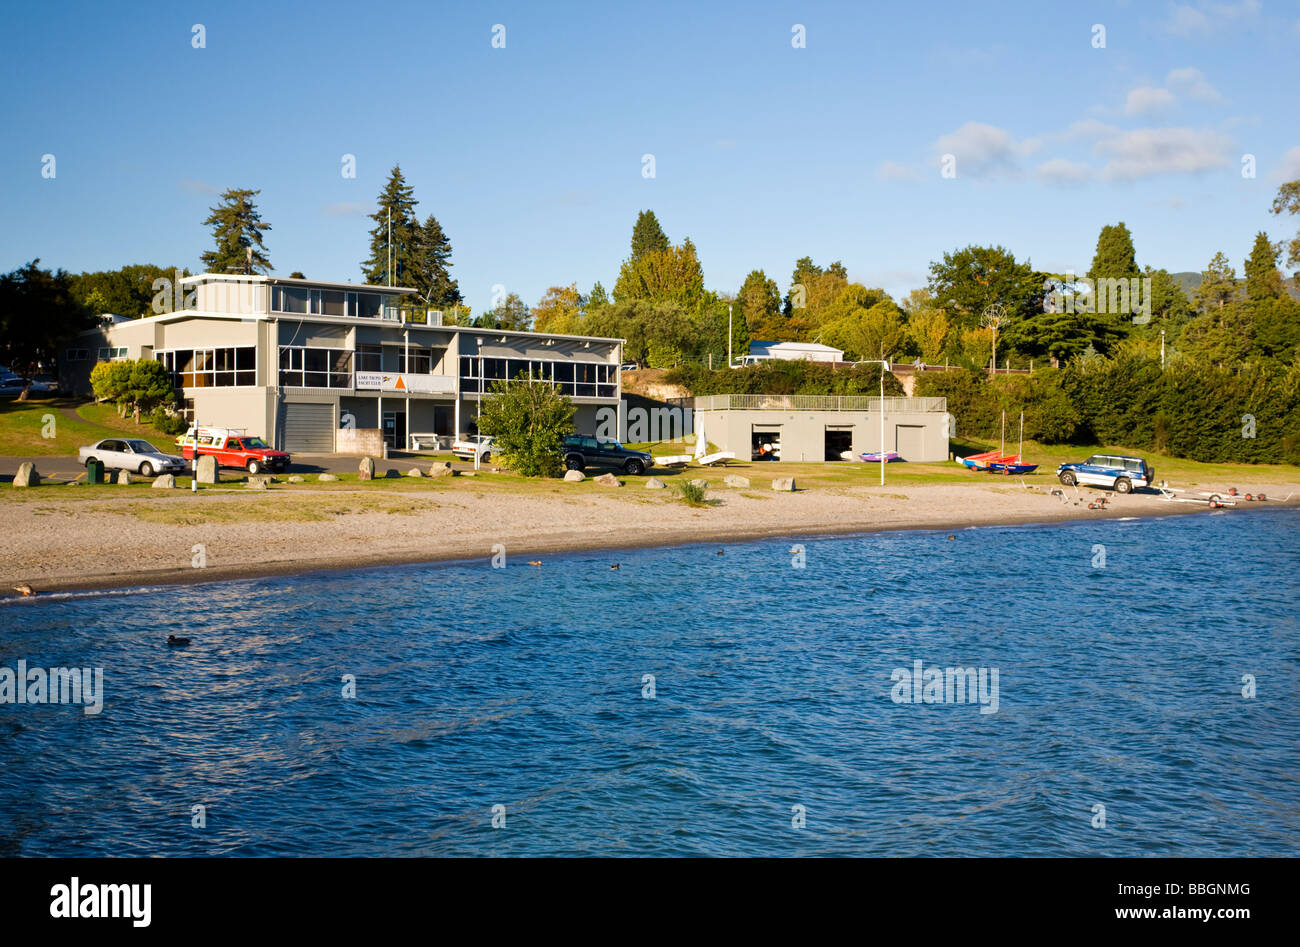 Lake Taupo Yacht Club North Island New Zealand - Stock Image